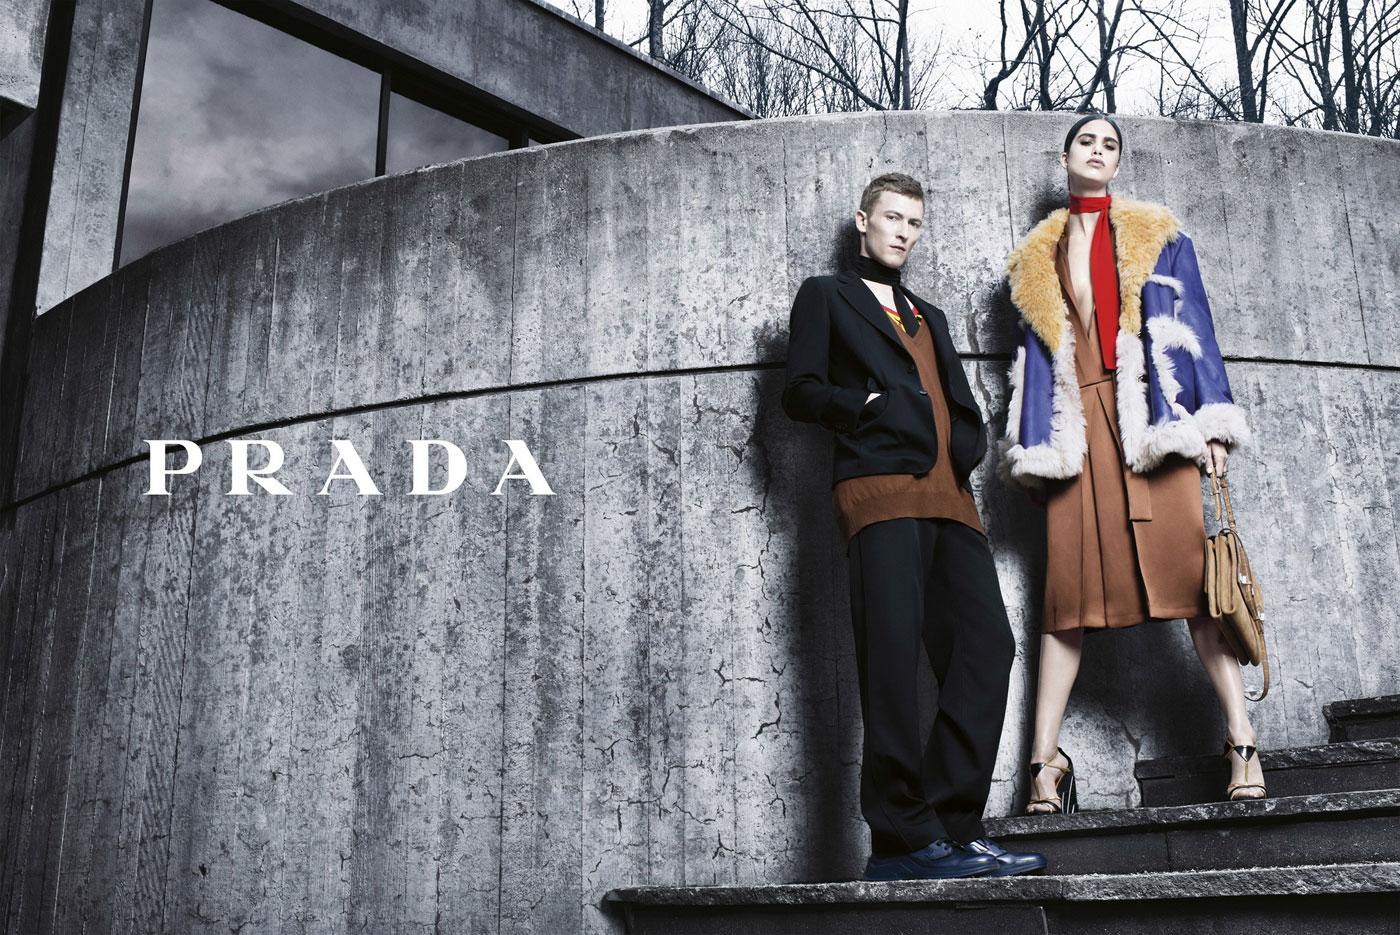 image: Prada